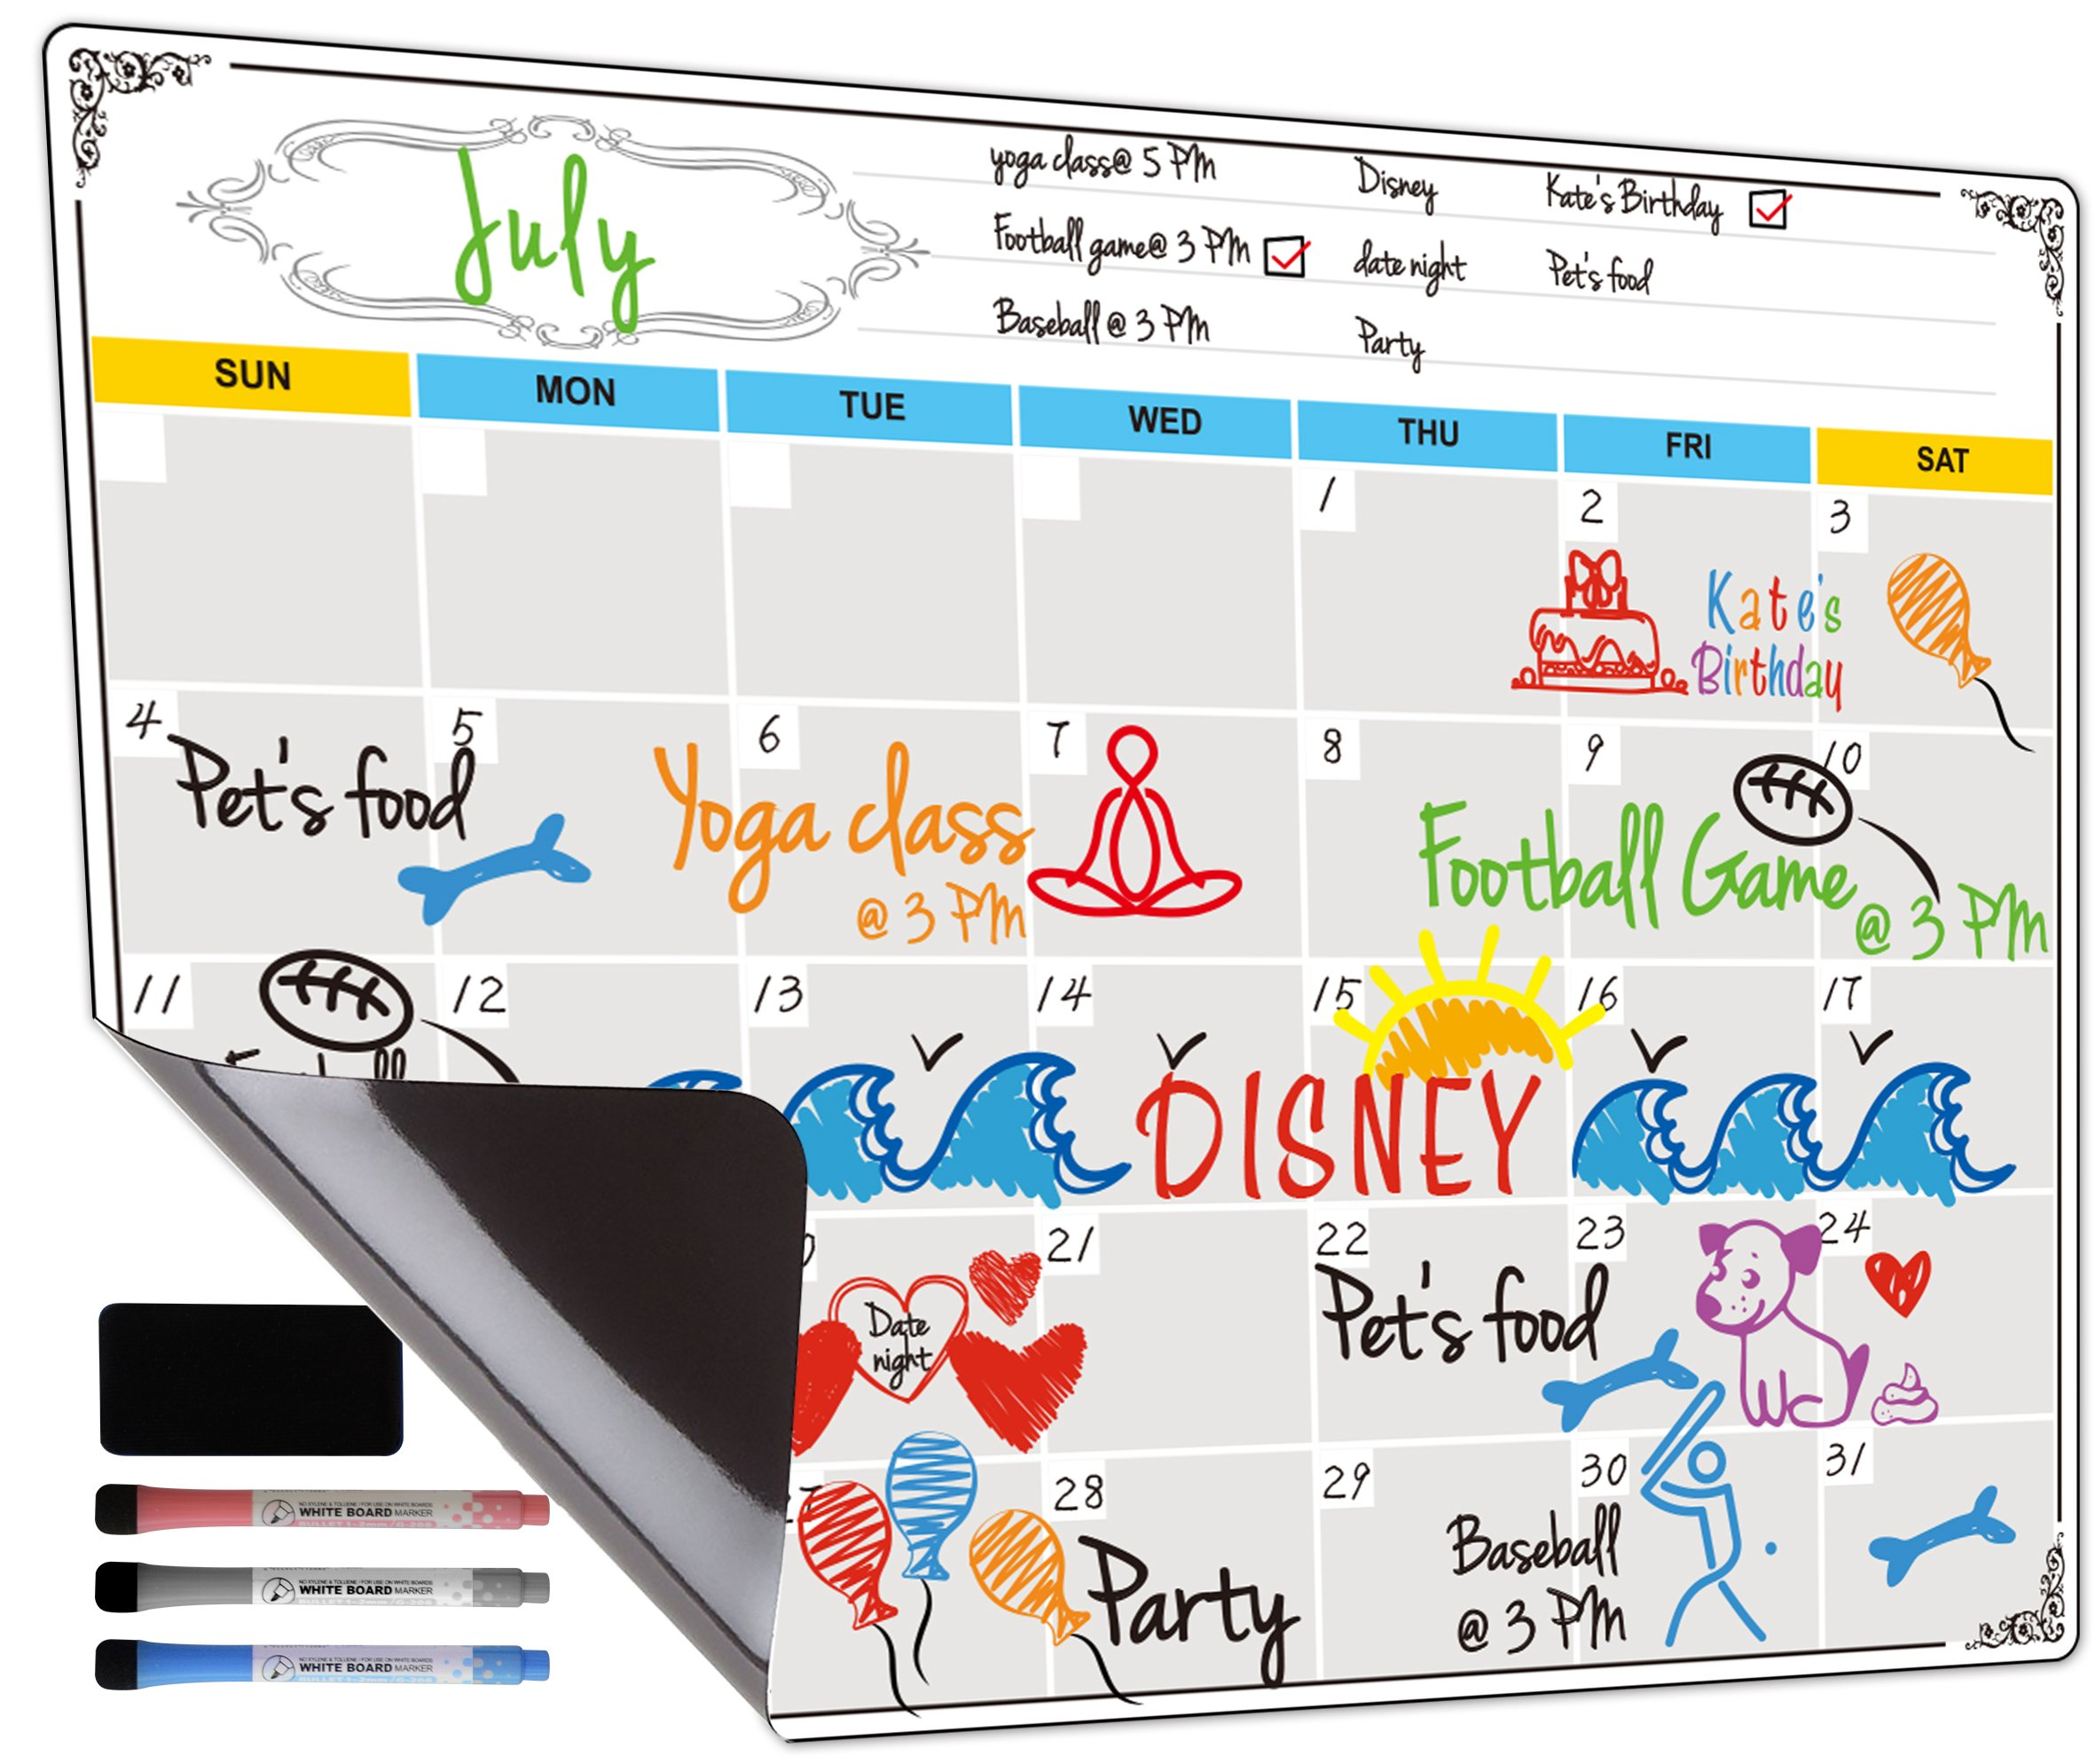 Dry Erase Calendar, Fridge Magnetic Calendar, White Board Planner for Refrigerator, Monthly & Weekly Set by Jancosta (MPB11) by Jancosta